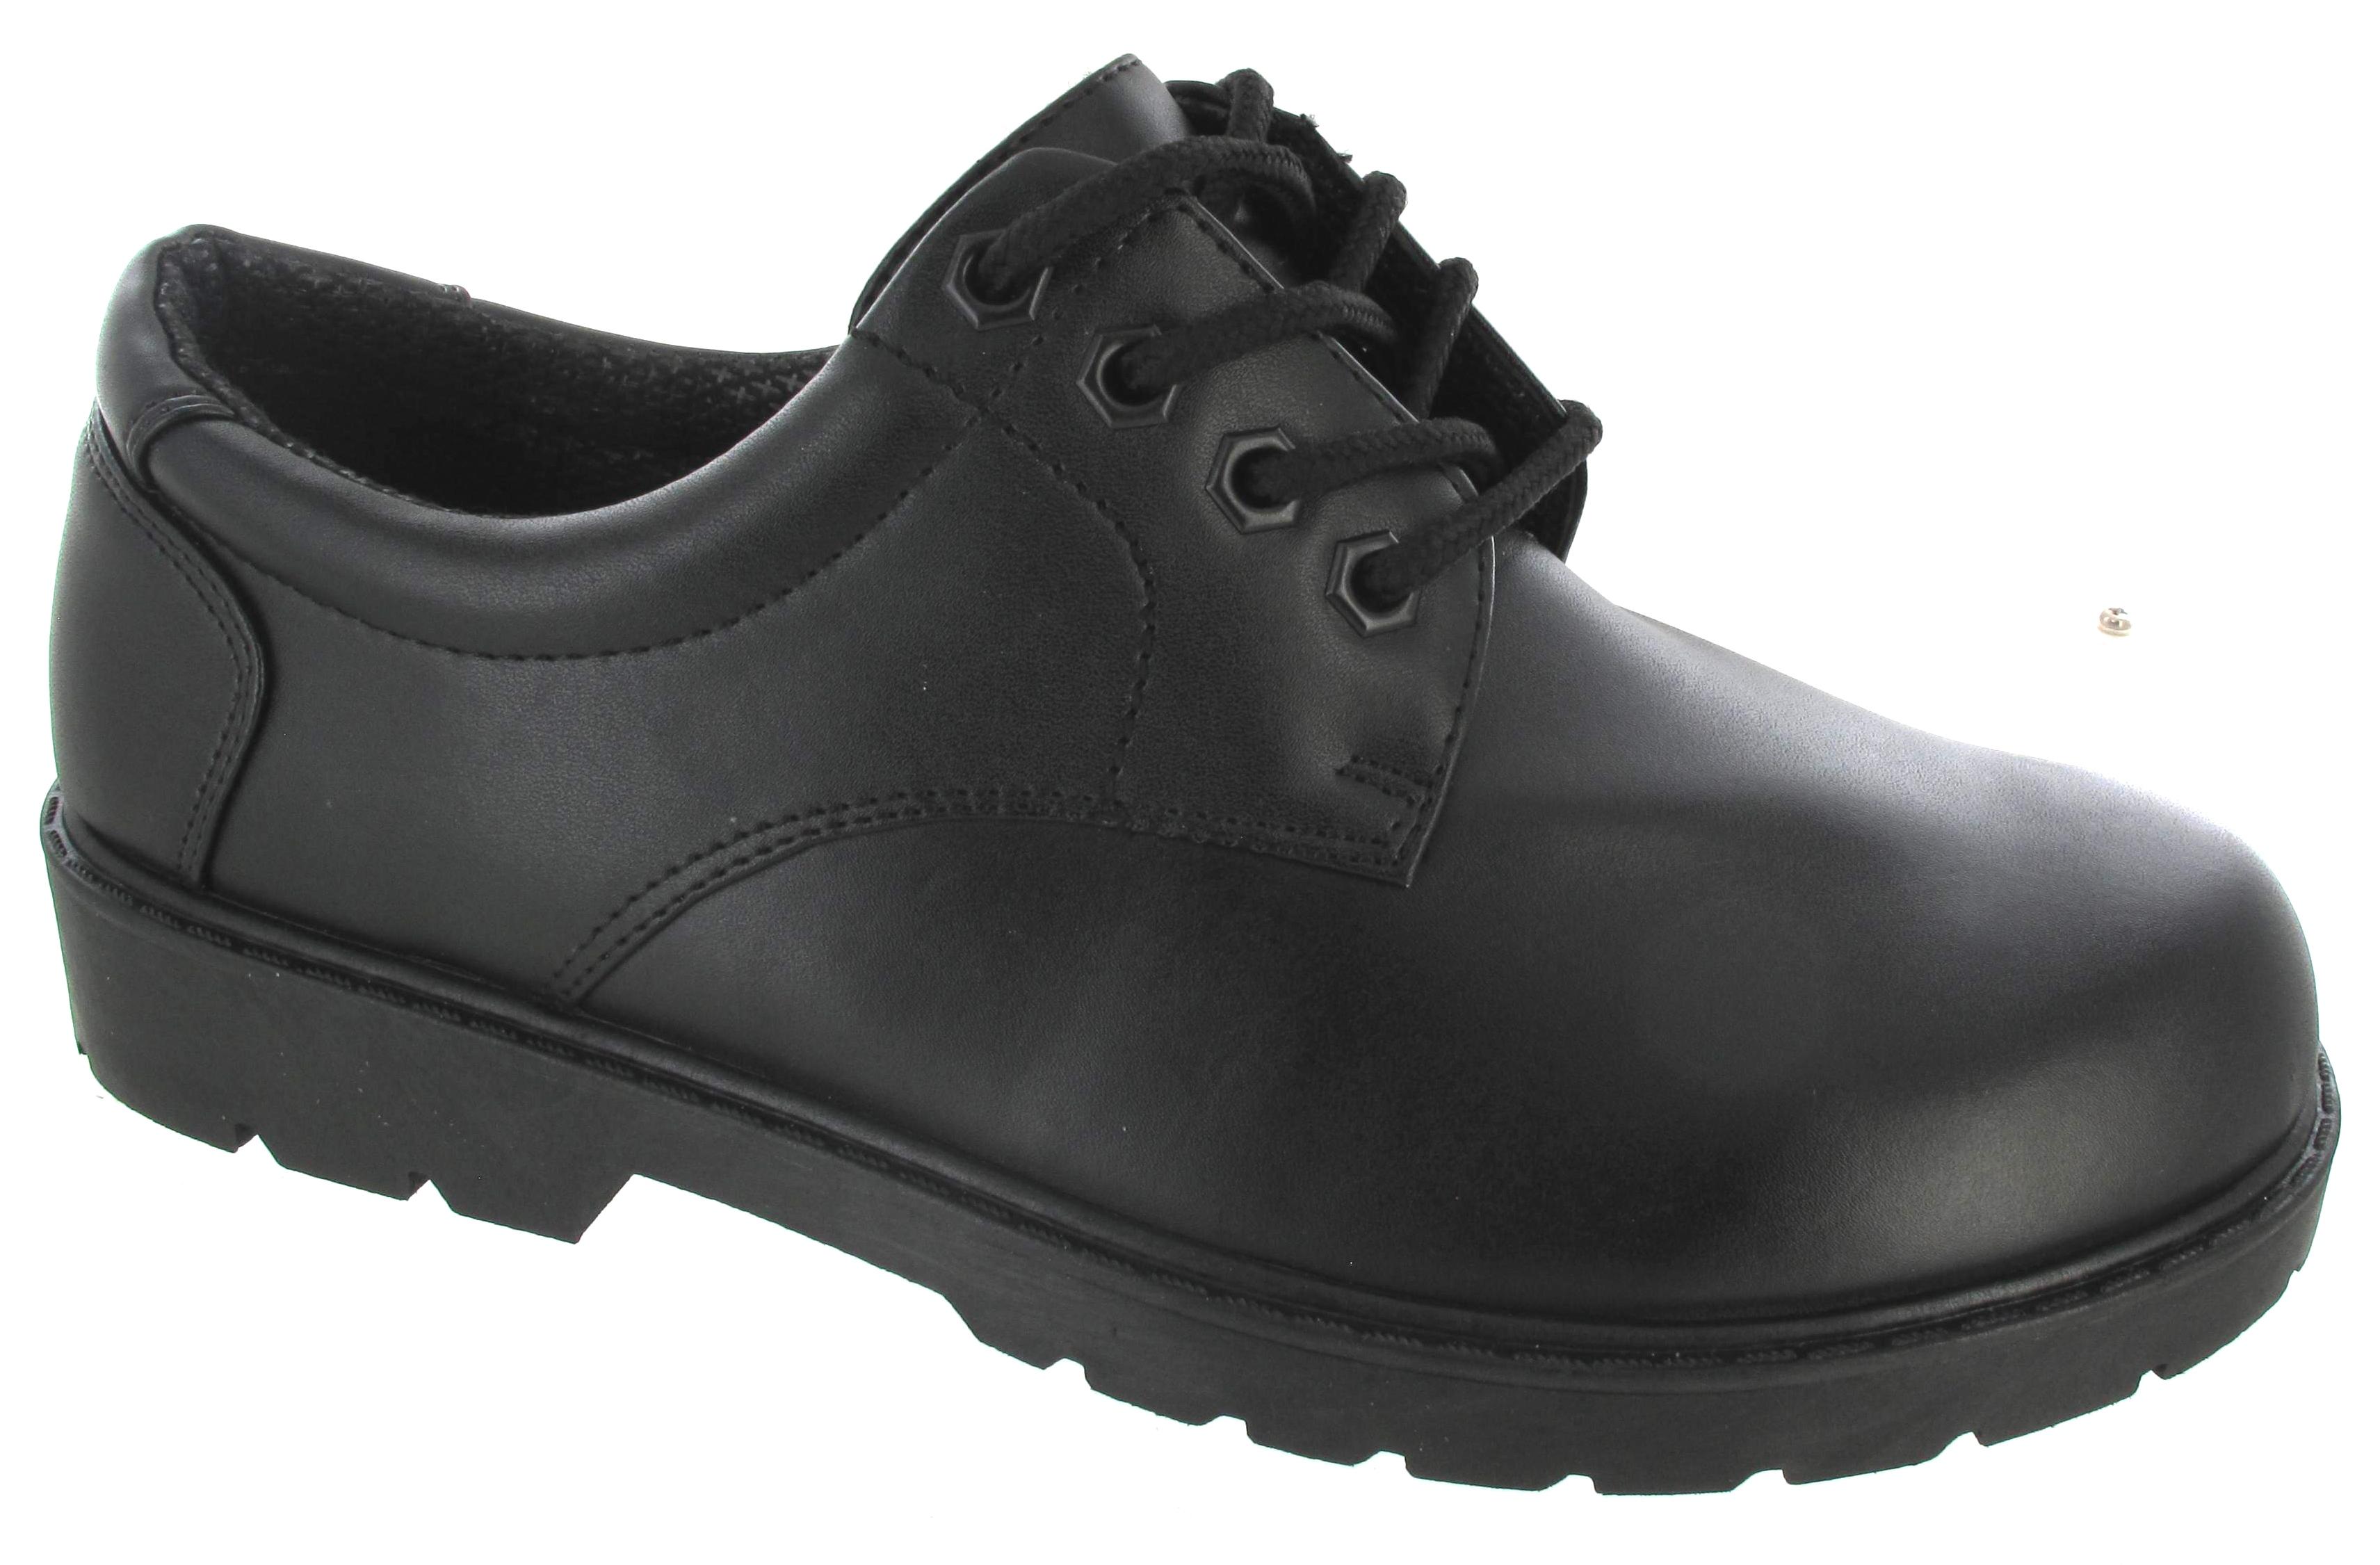 mens new smart work shoe plain black school office boys